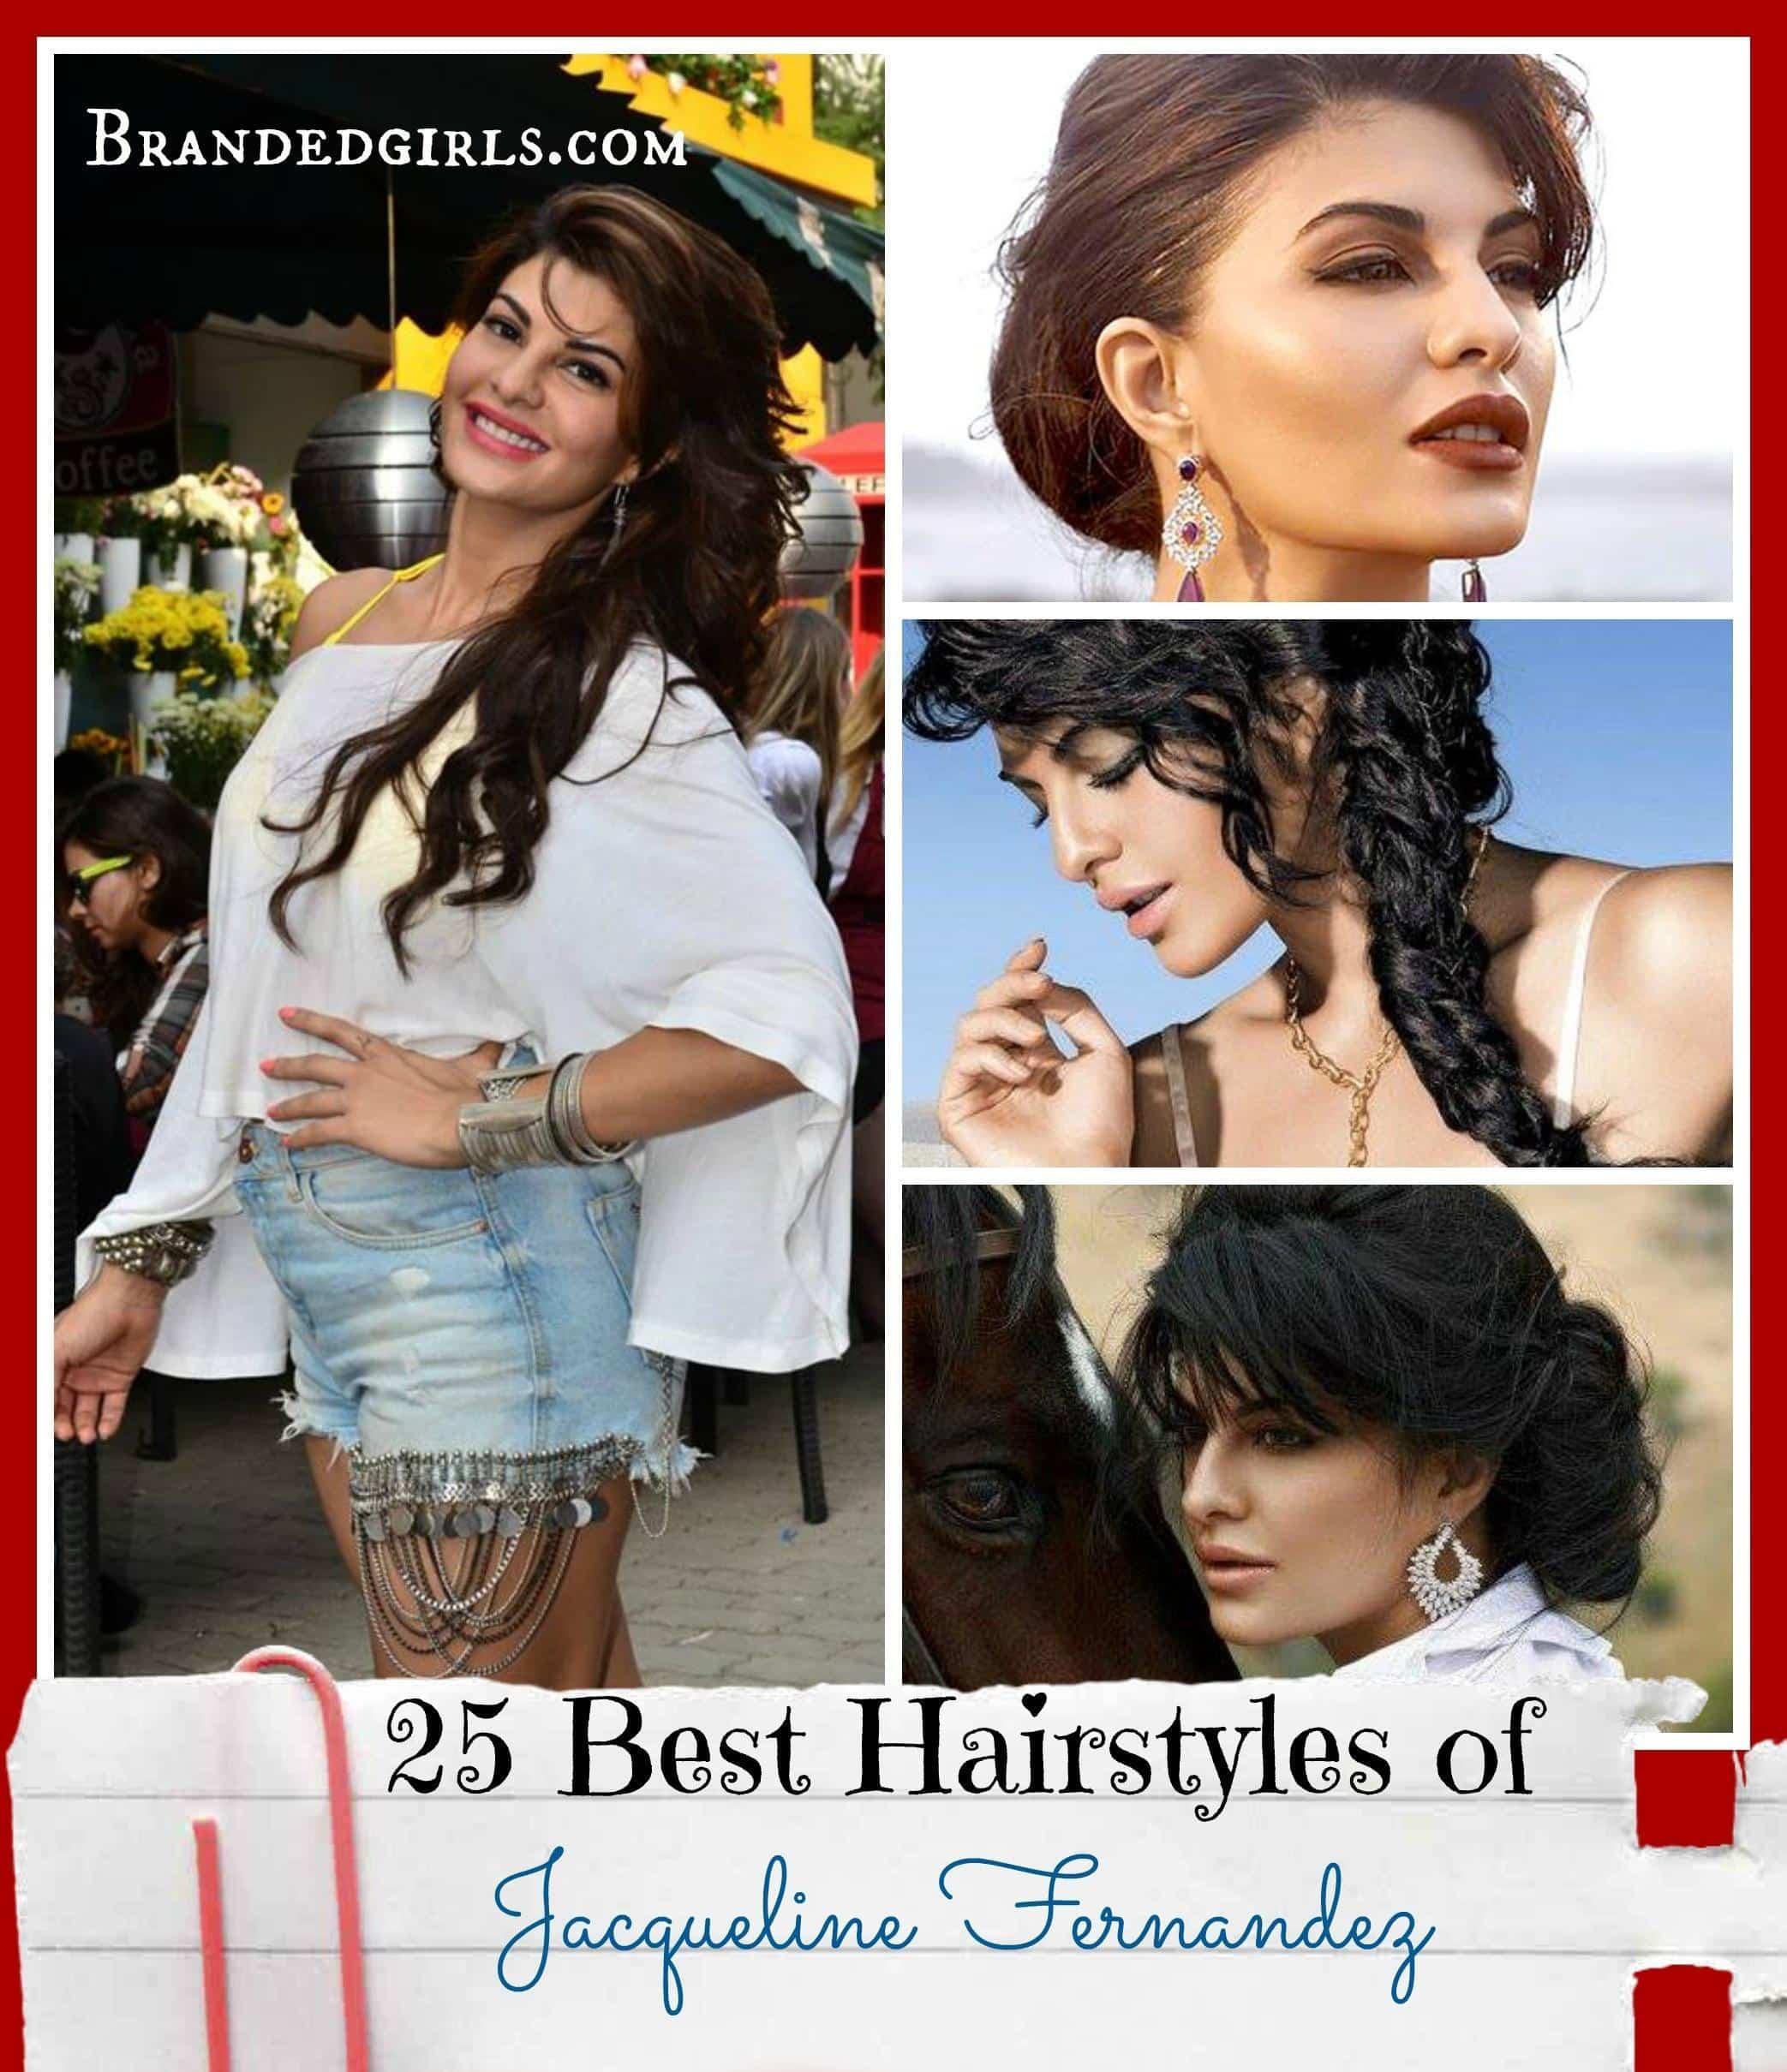 jacqueline fernandez hairstyles